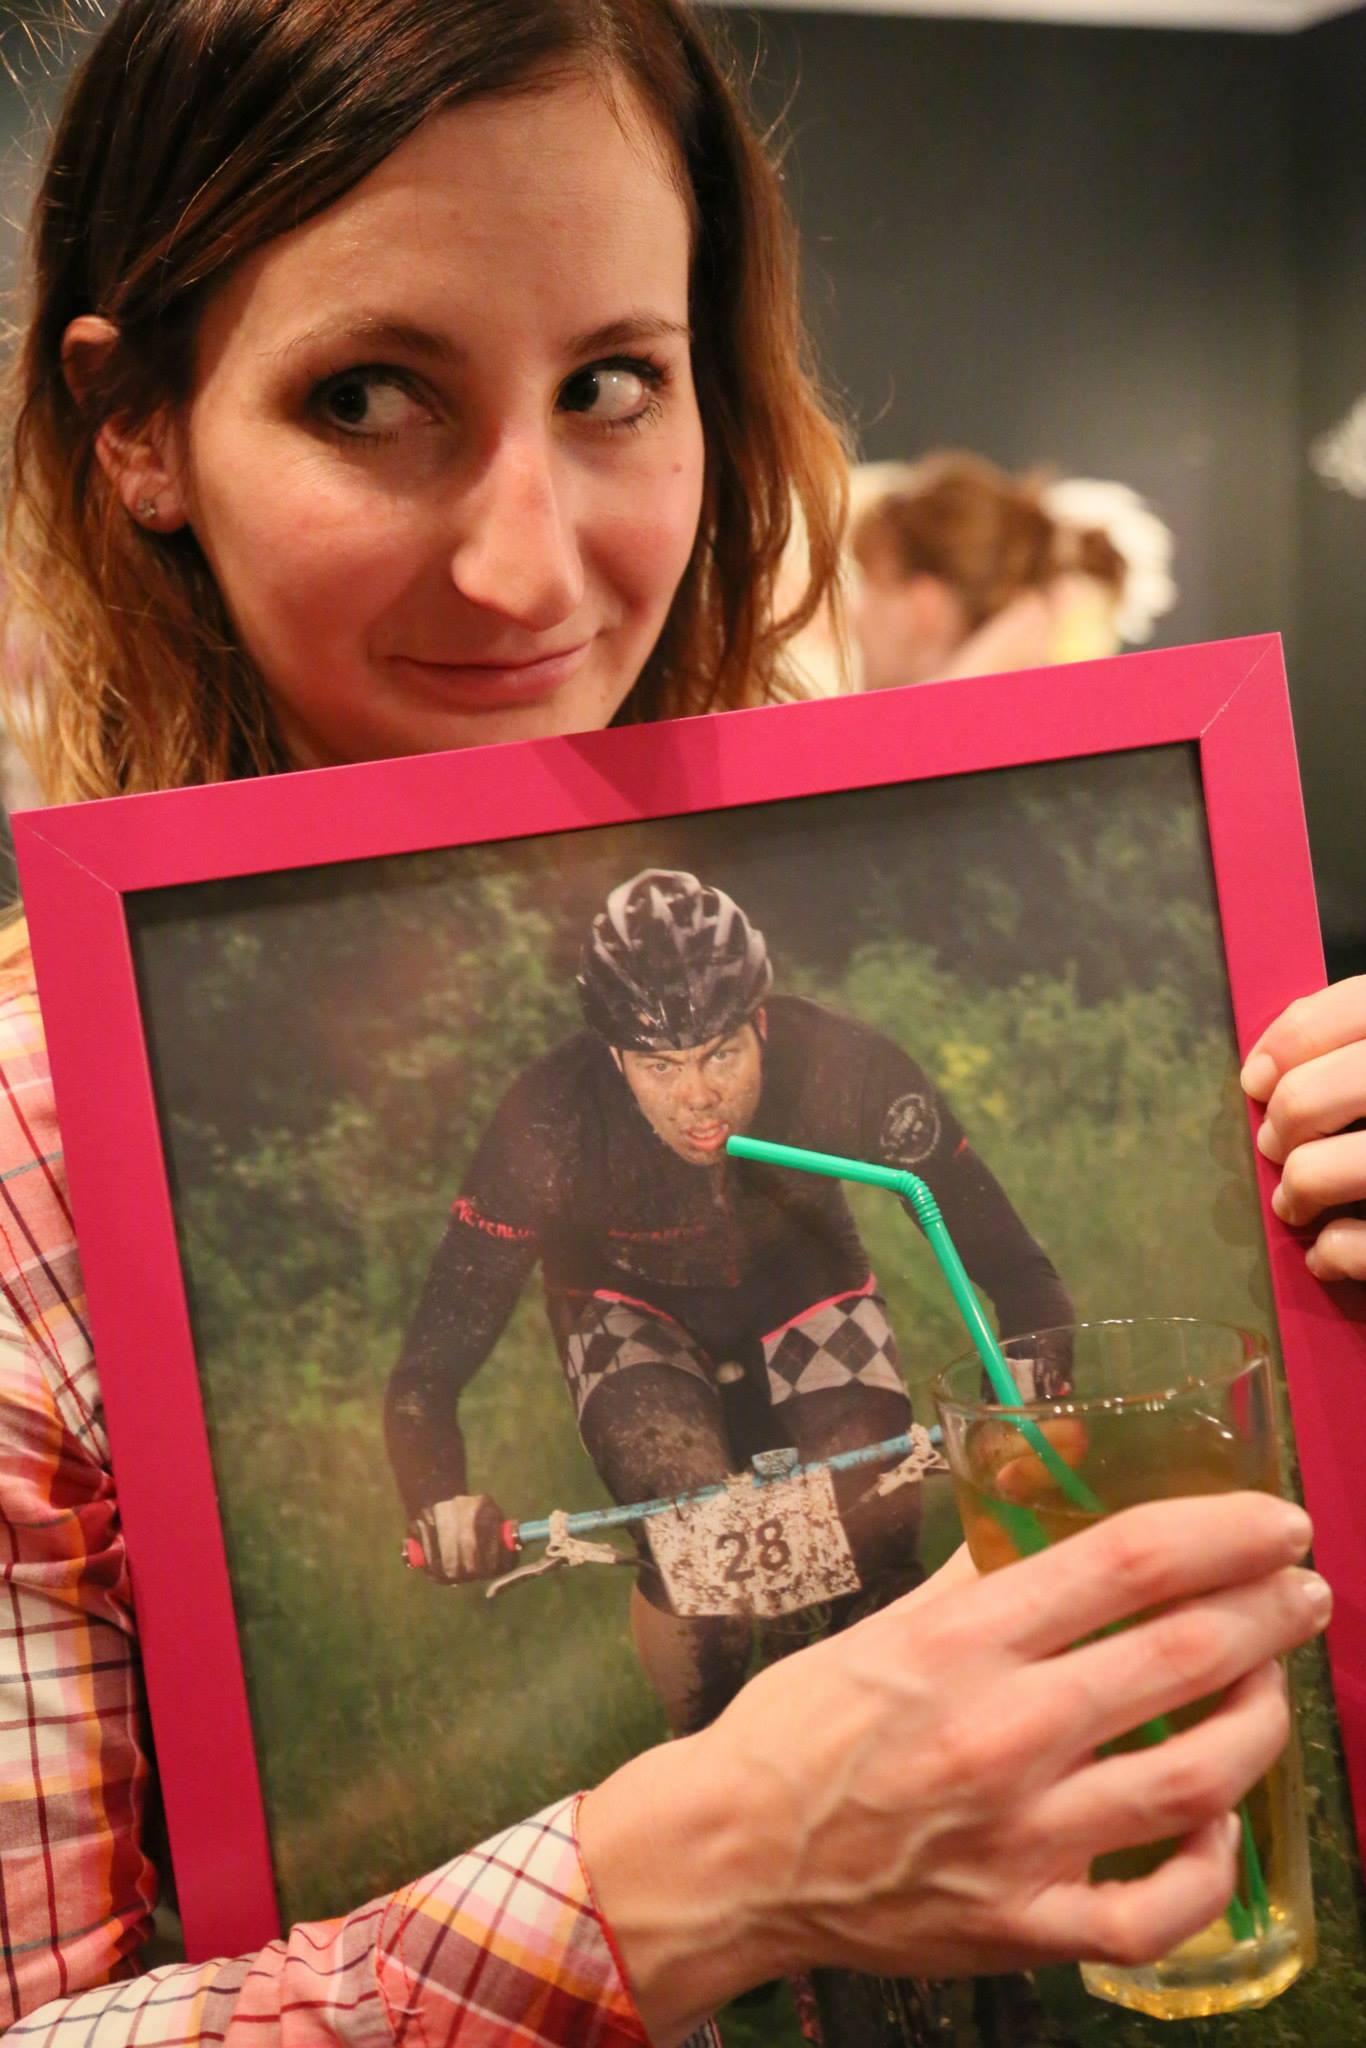 mountainbike_challenge_evzaro.jpg